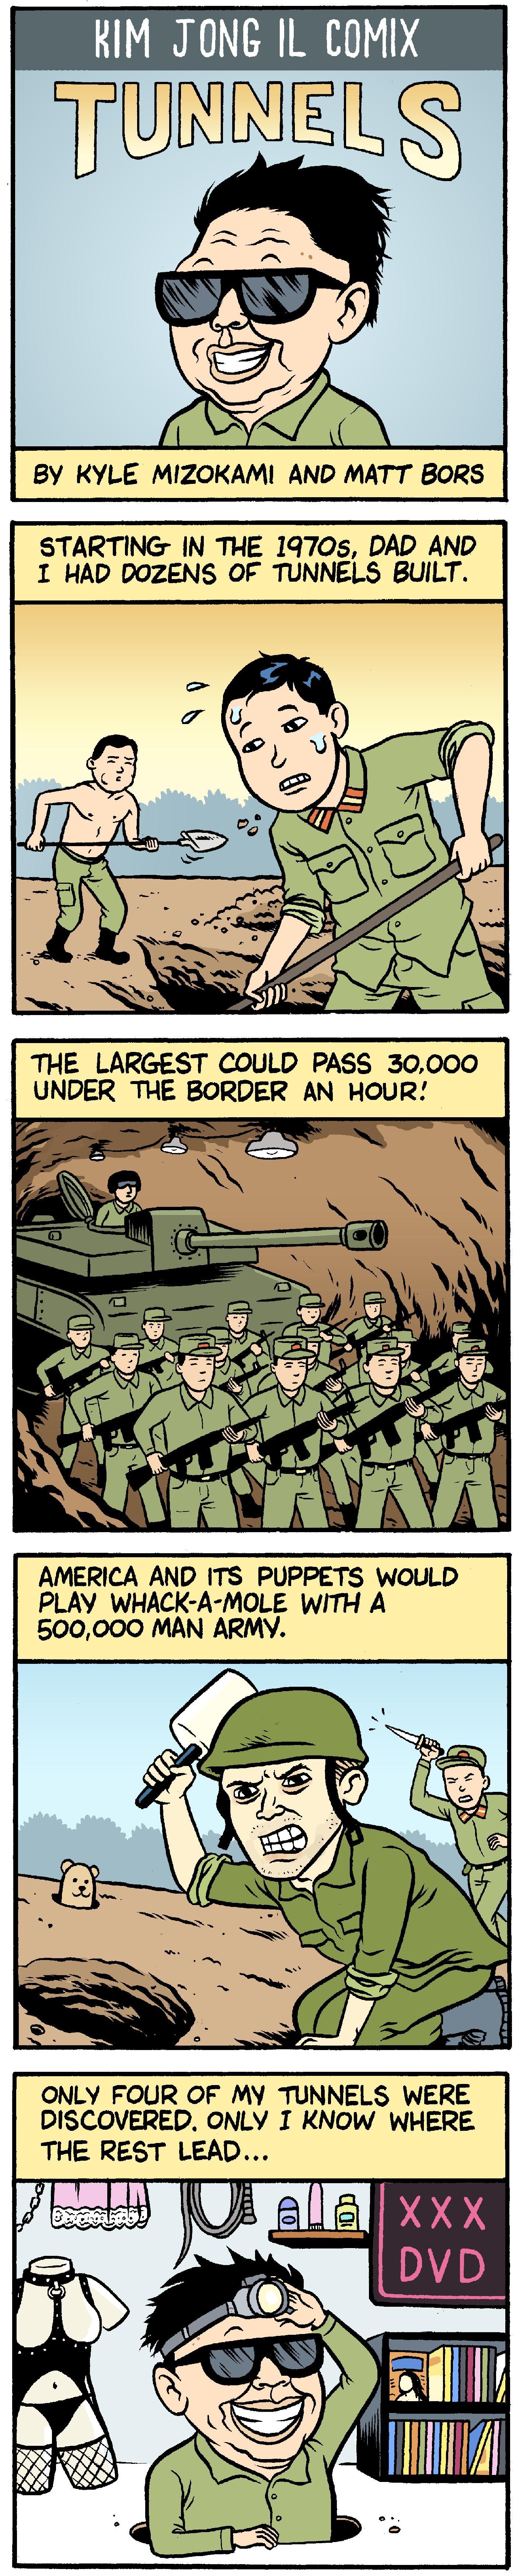 Kim Jong Il Comix #1